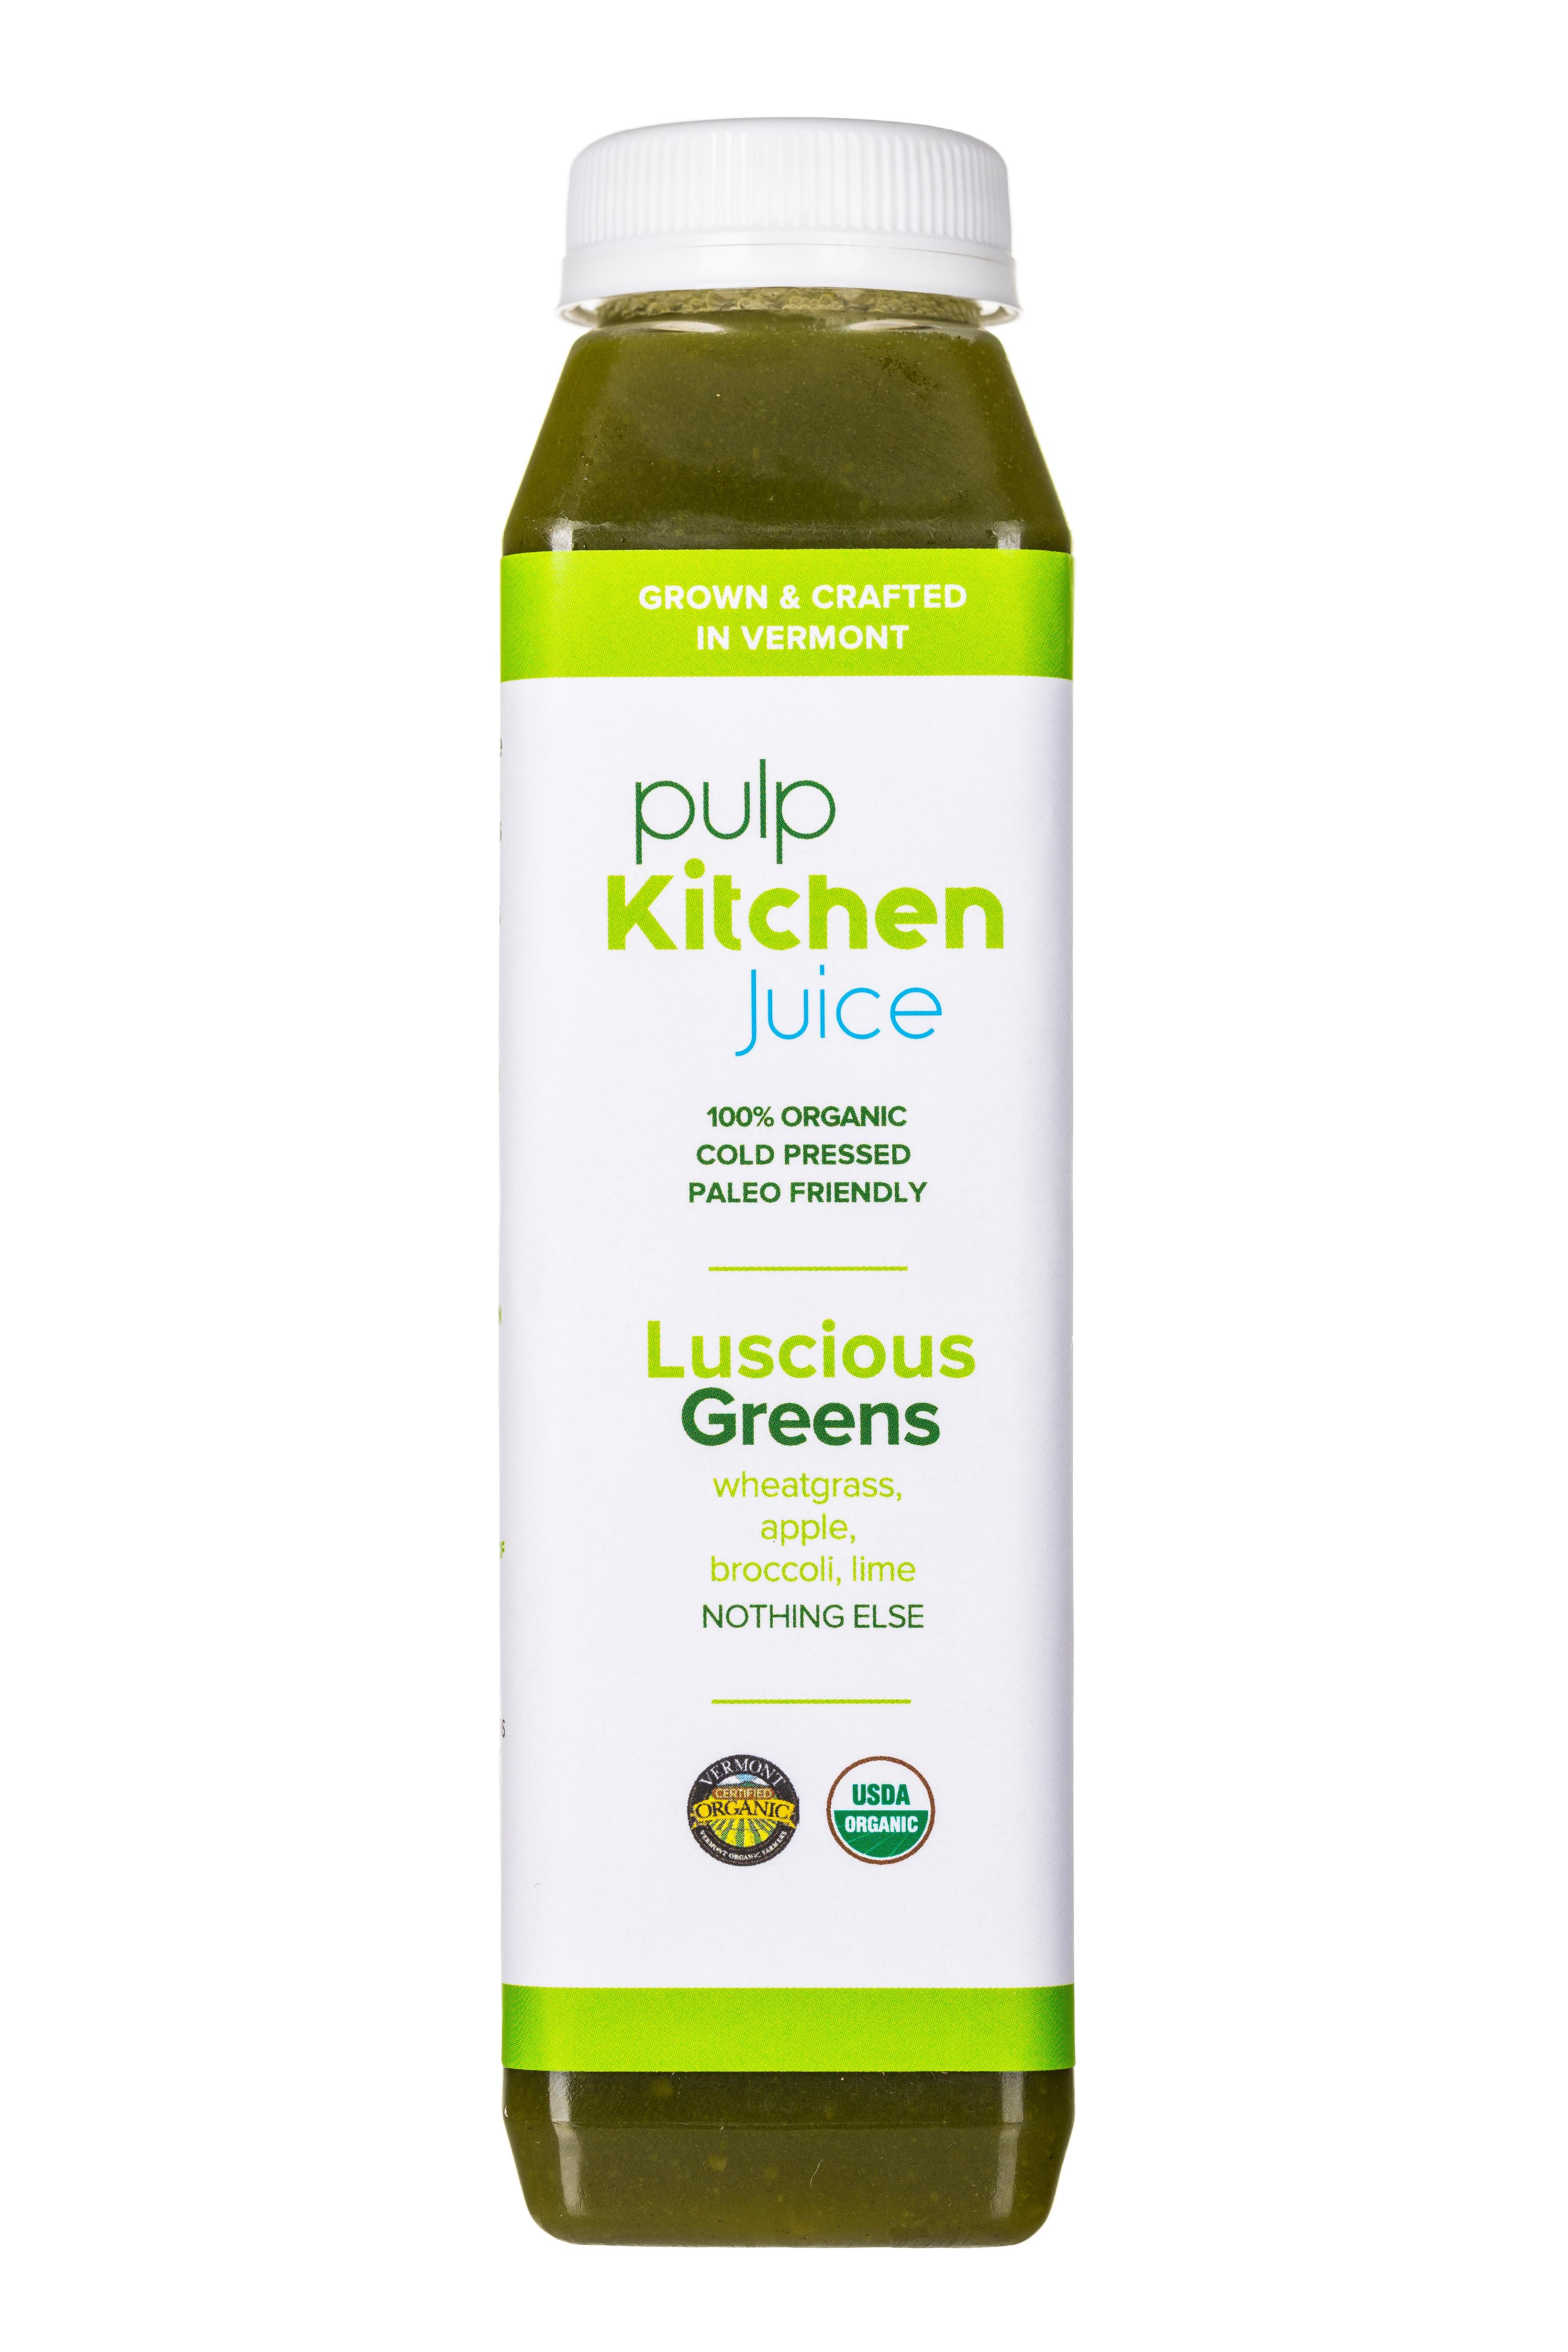 Pulp Kitchen Juice: PulpKitchen-Juice-LusciousGreens-Fronts